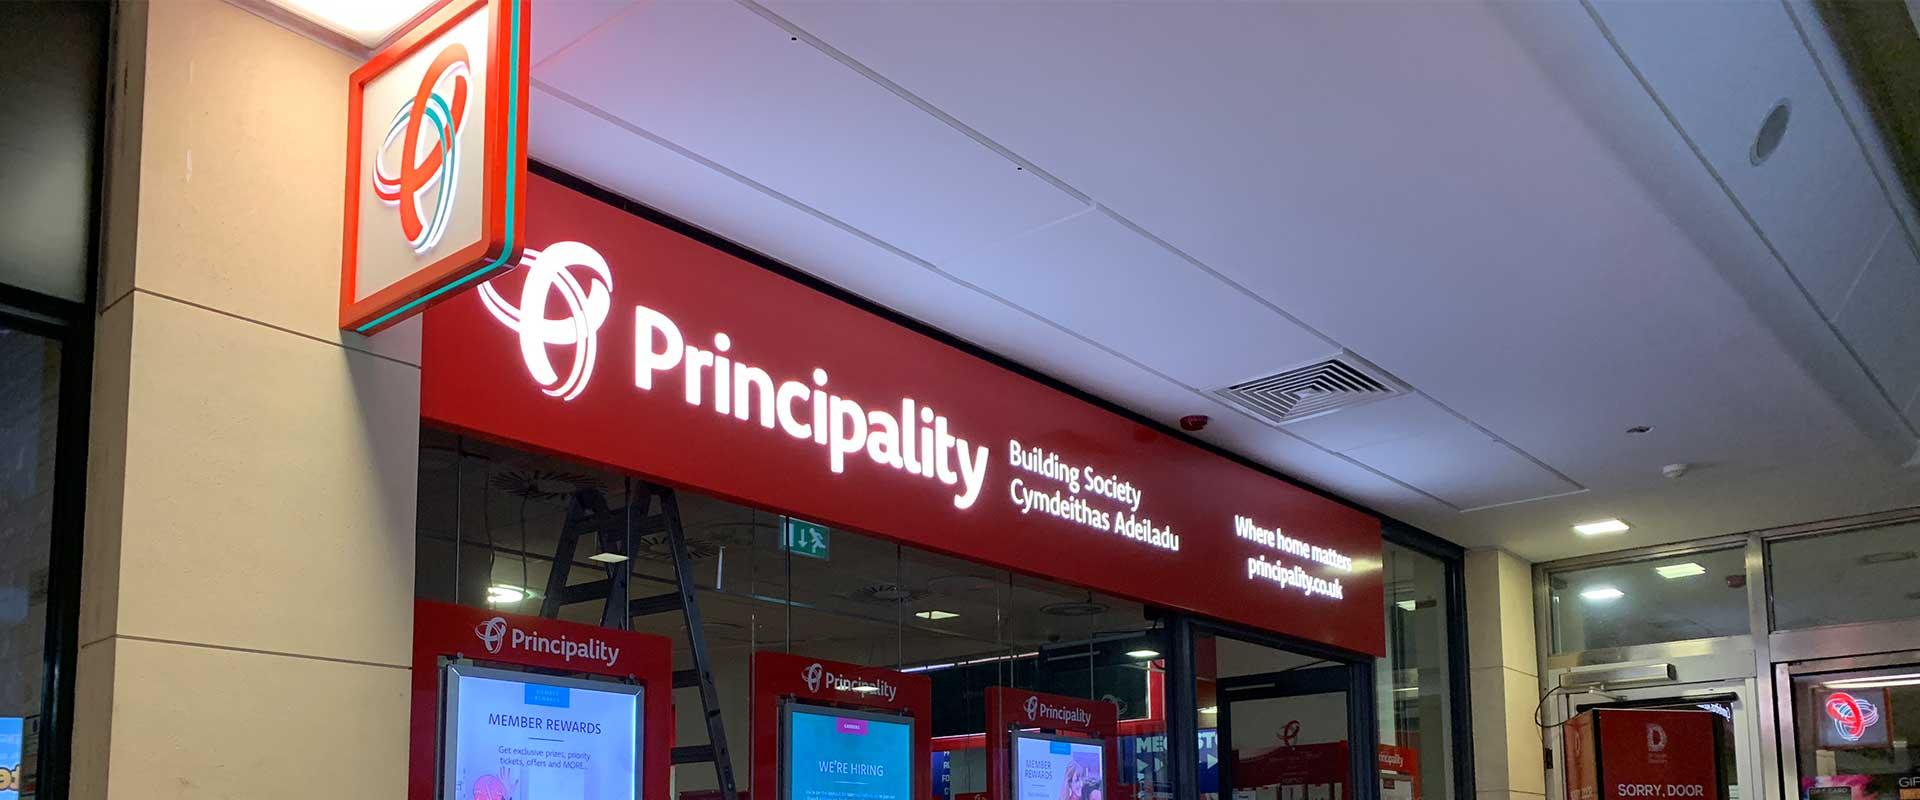 Principality Building Society St Davids external signage